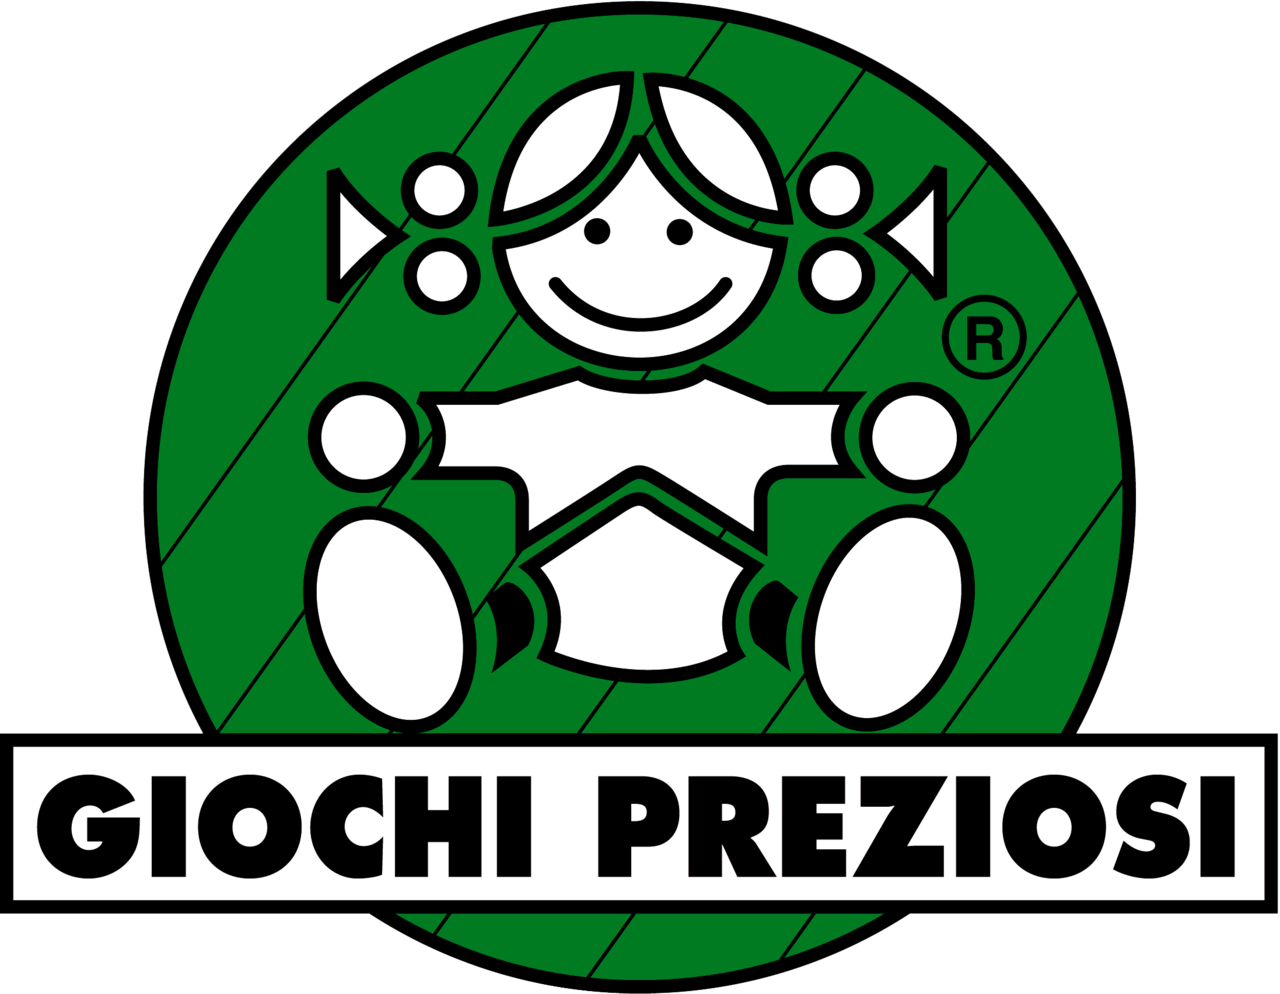 GIOCHI PREZIOSI ITALIA SRL